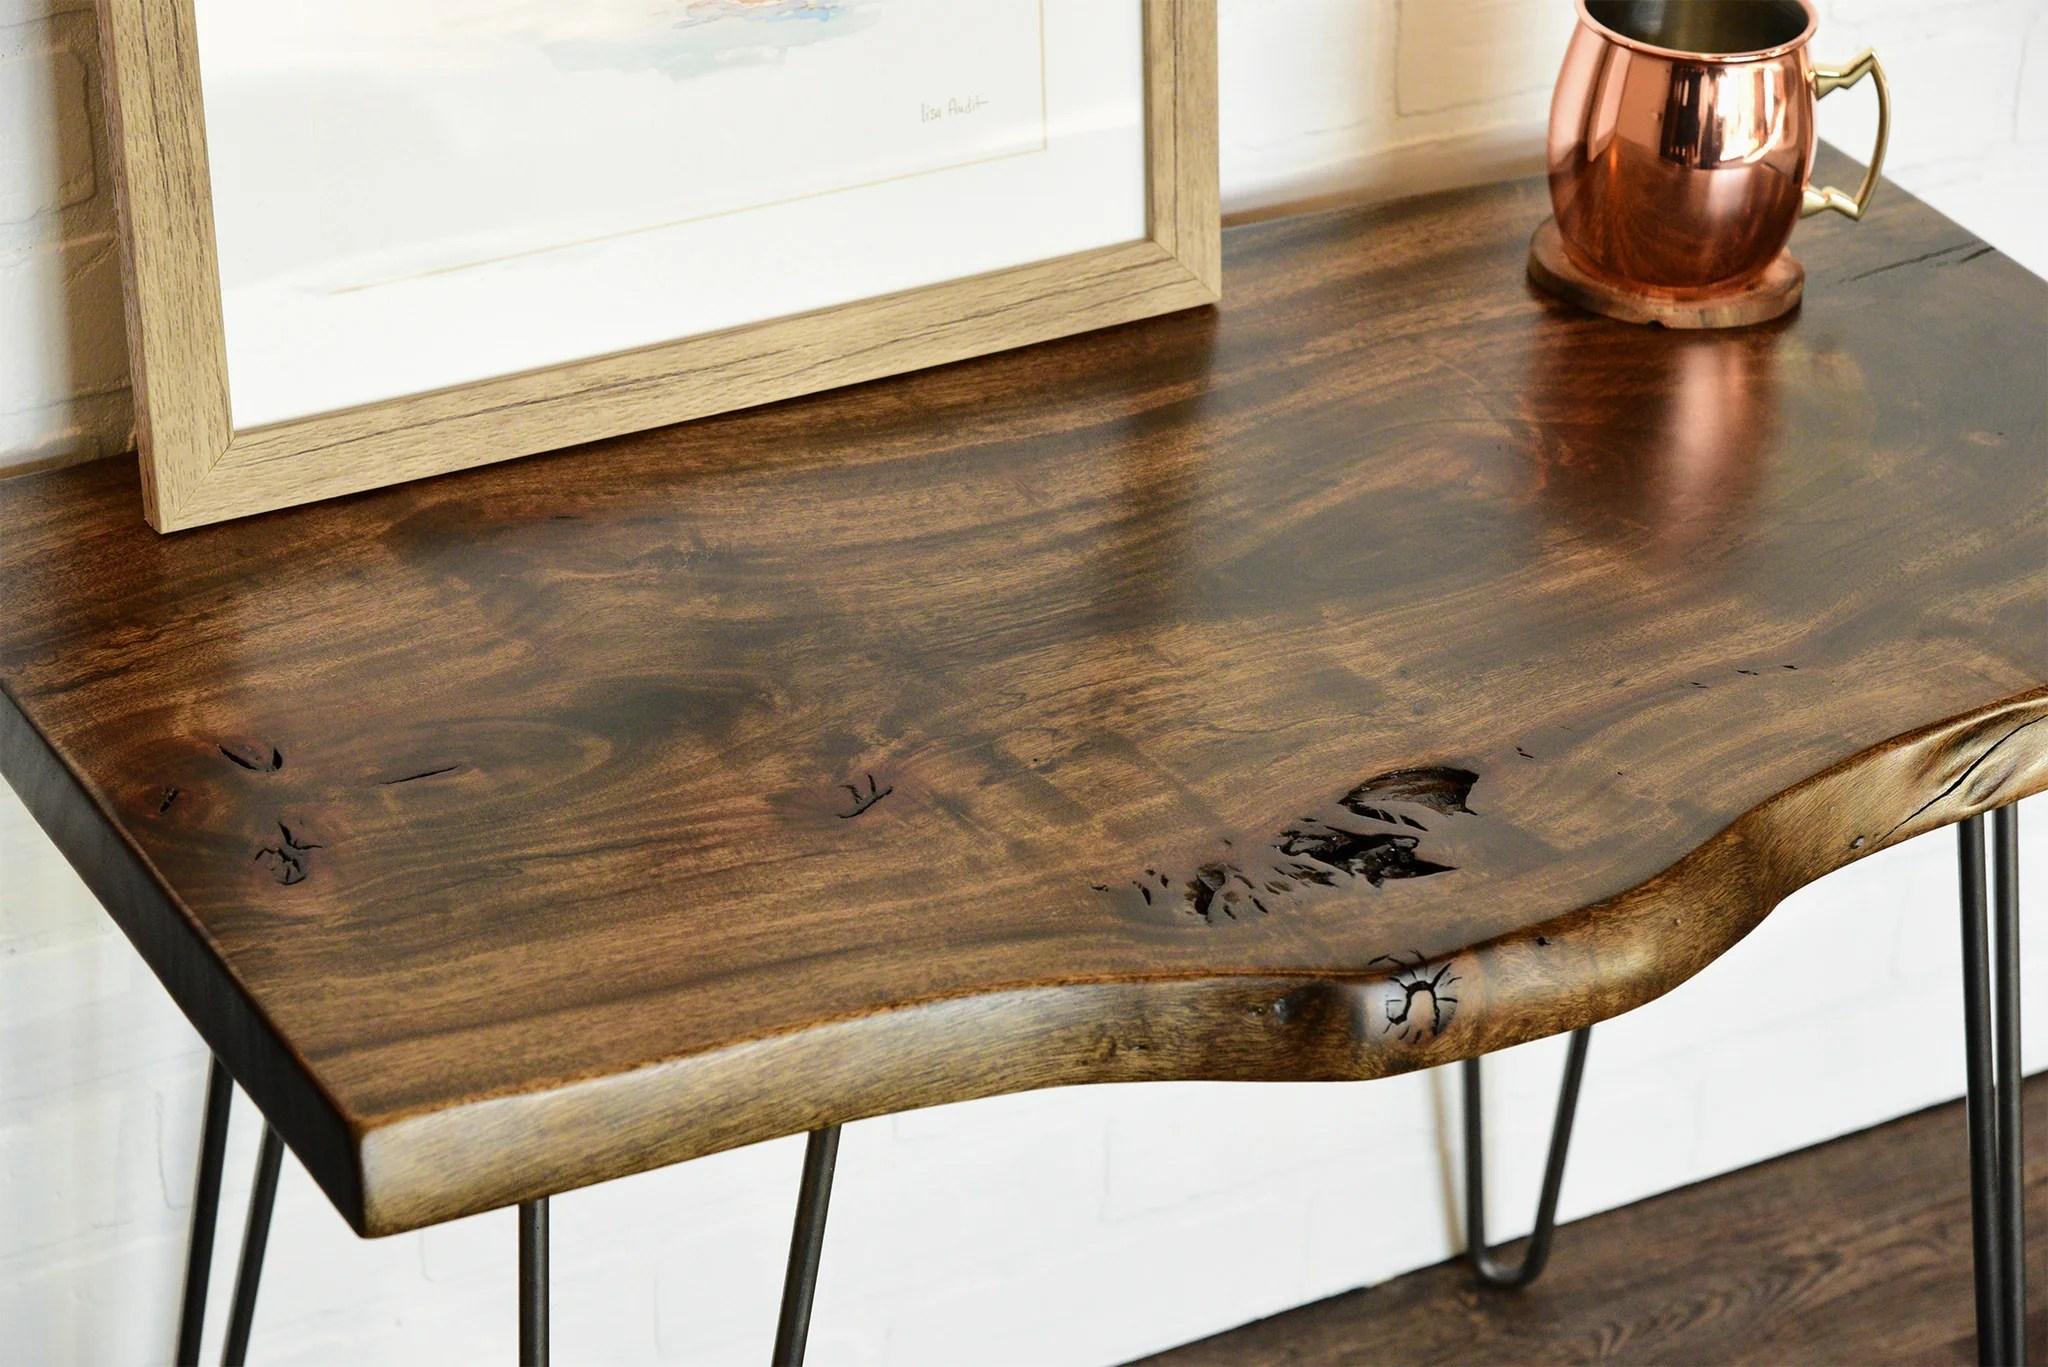 Excellent Live Edge Slab Rustic End Table Live Edge Slab Rustic End Table Woodwaves Rustic End Tables Amazon Rustic End Tables Pinterest houzz-03 Rustic End Tables